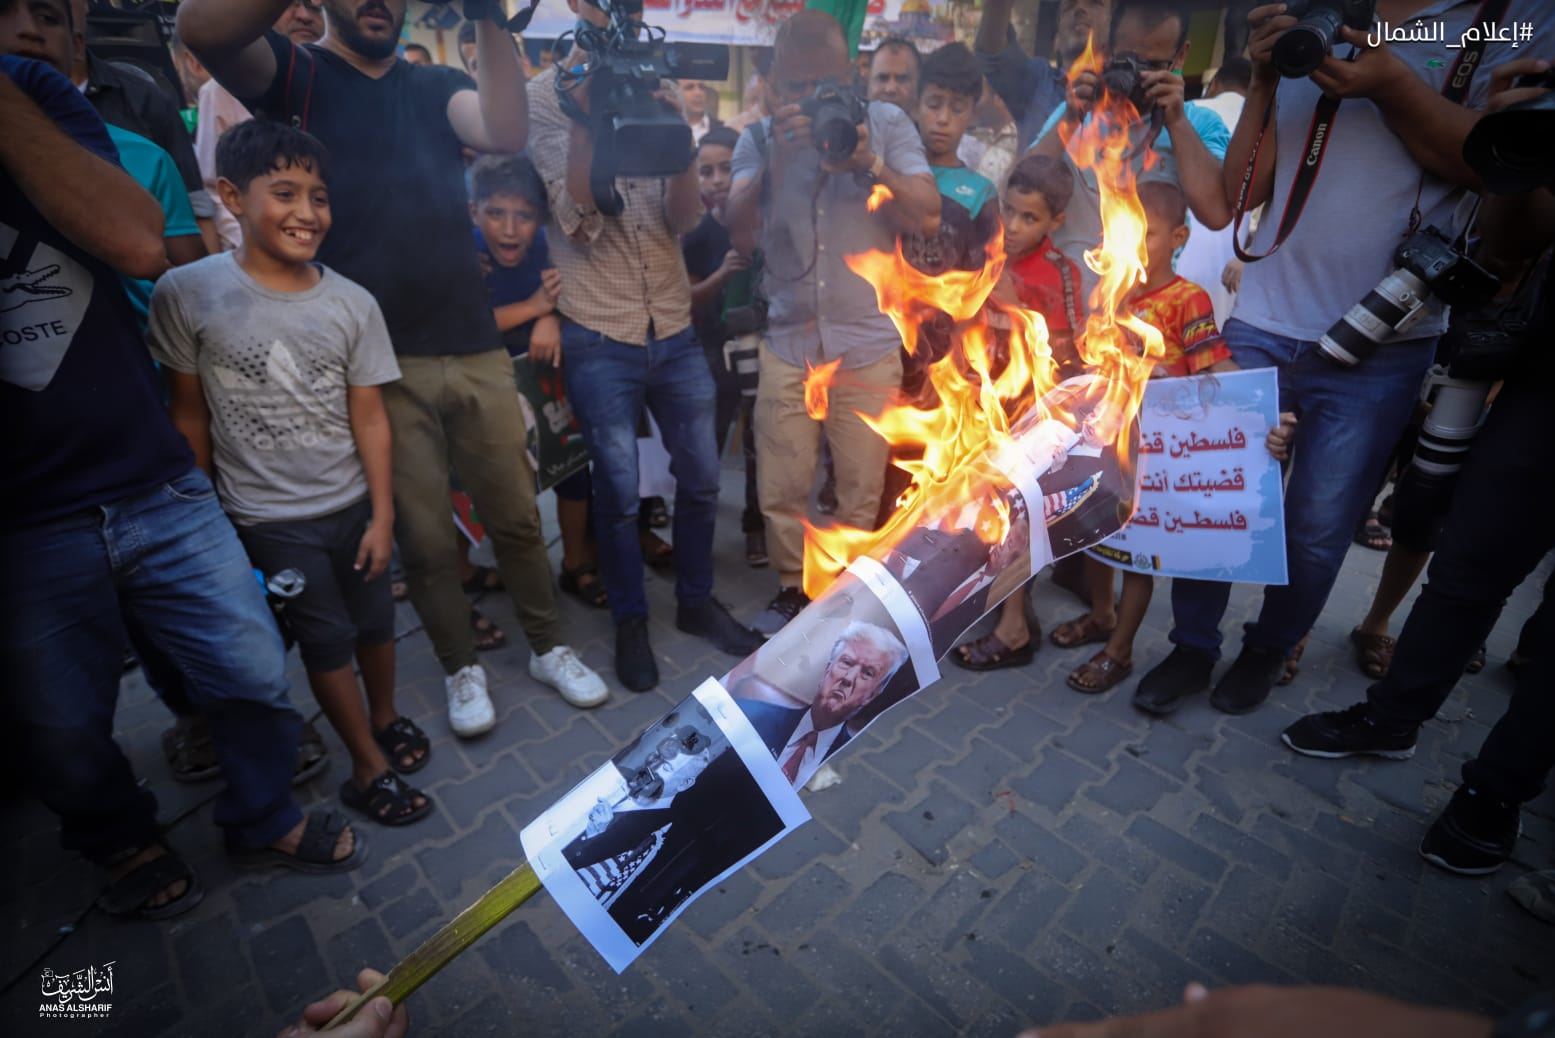 13990525000948 Test NewPhotoFree » مجله اینترنتی کوشا » ادامه تظاهرات در محکومیت توافق ضد فلسطینی امارات و رژیم صهیونیستی 3